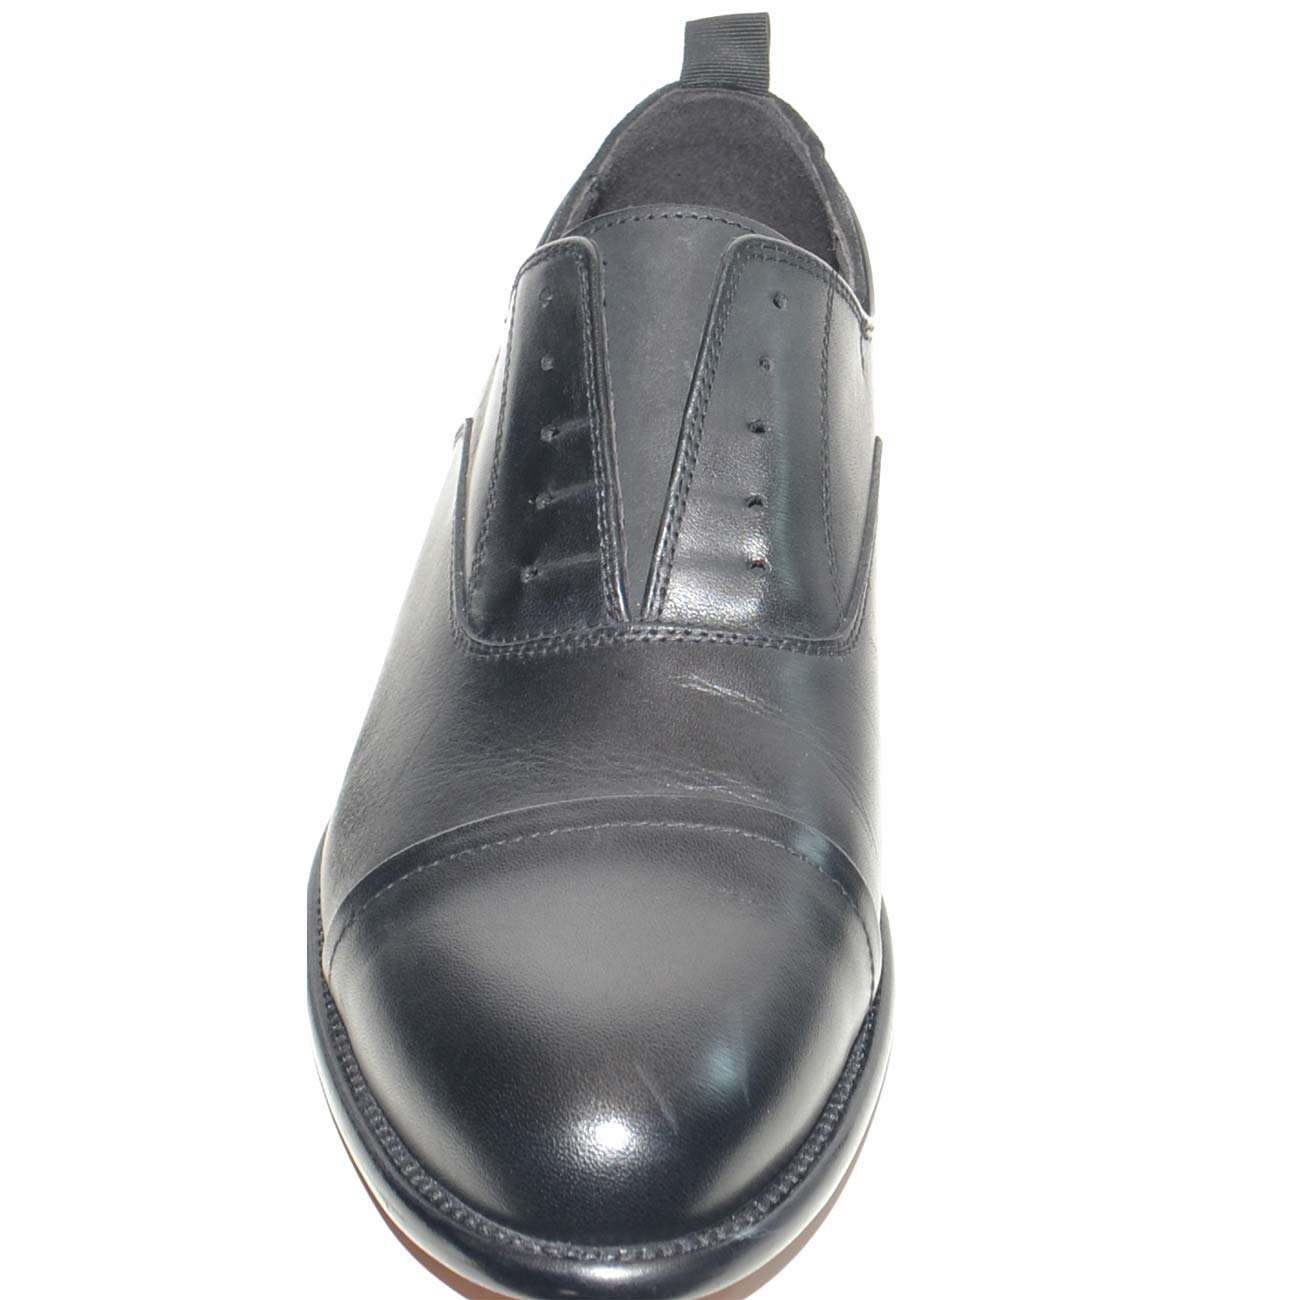 Scarpe uomo francesina inglese punta alzata senza lacci vera pelle lucida  nero made in italy fondo 70dc9e46fa6